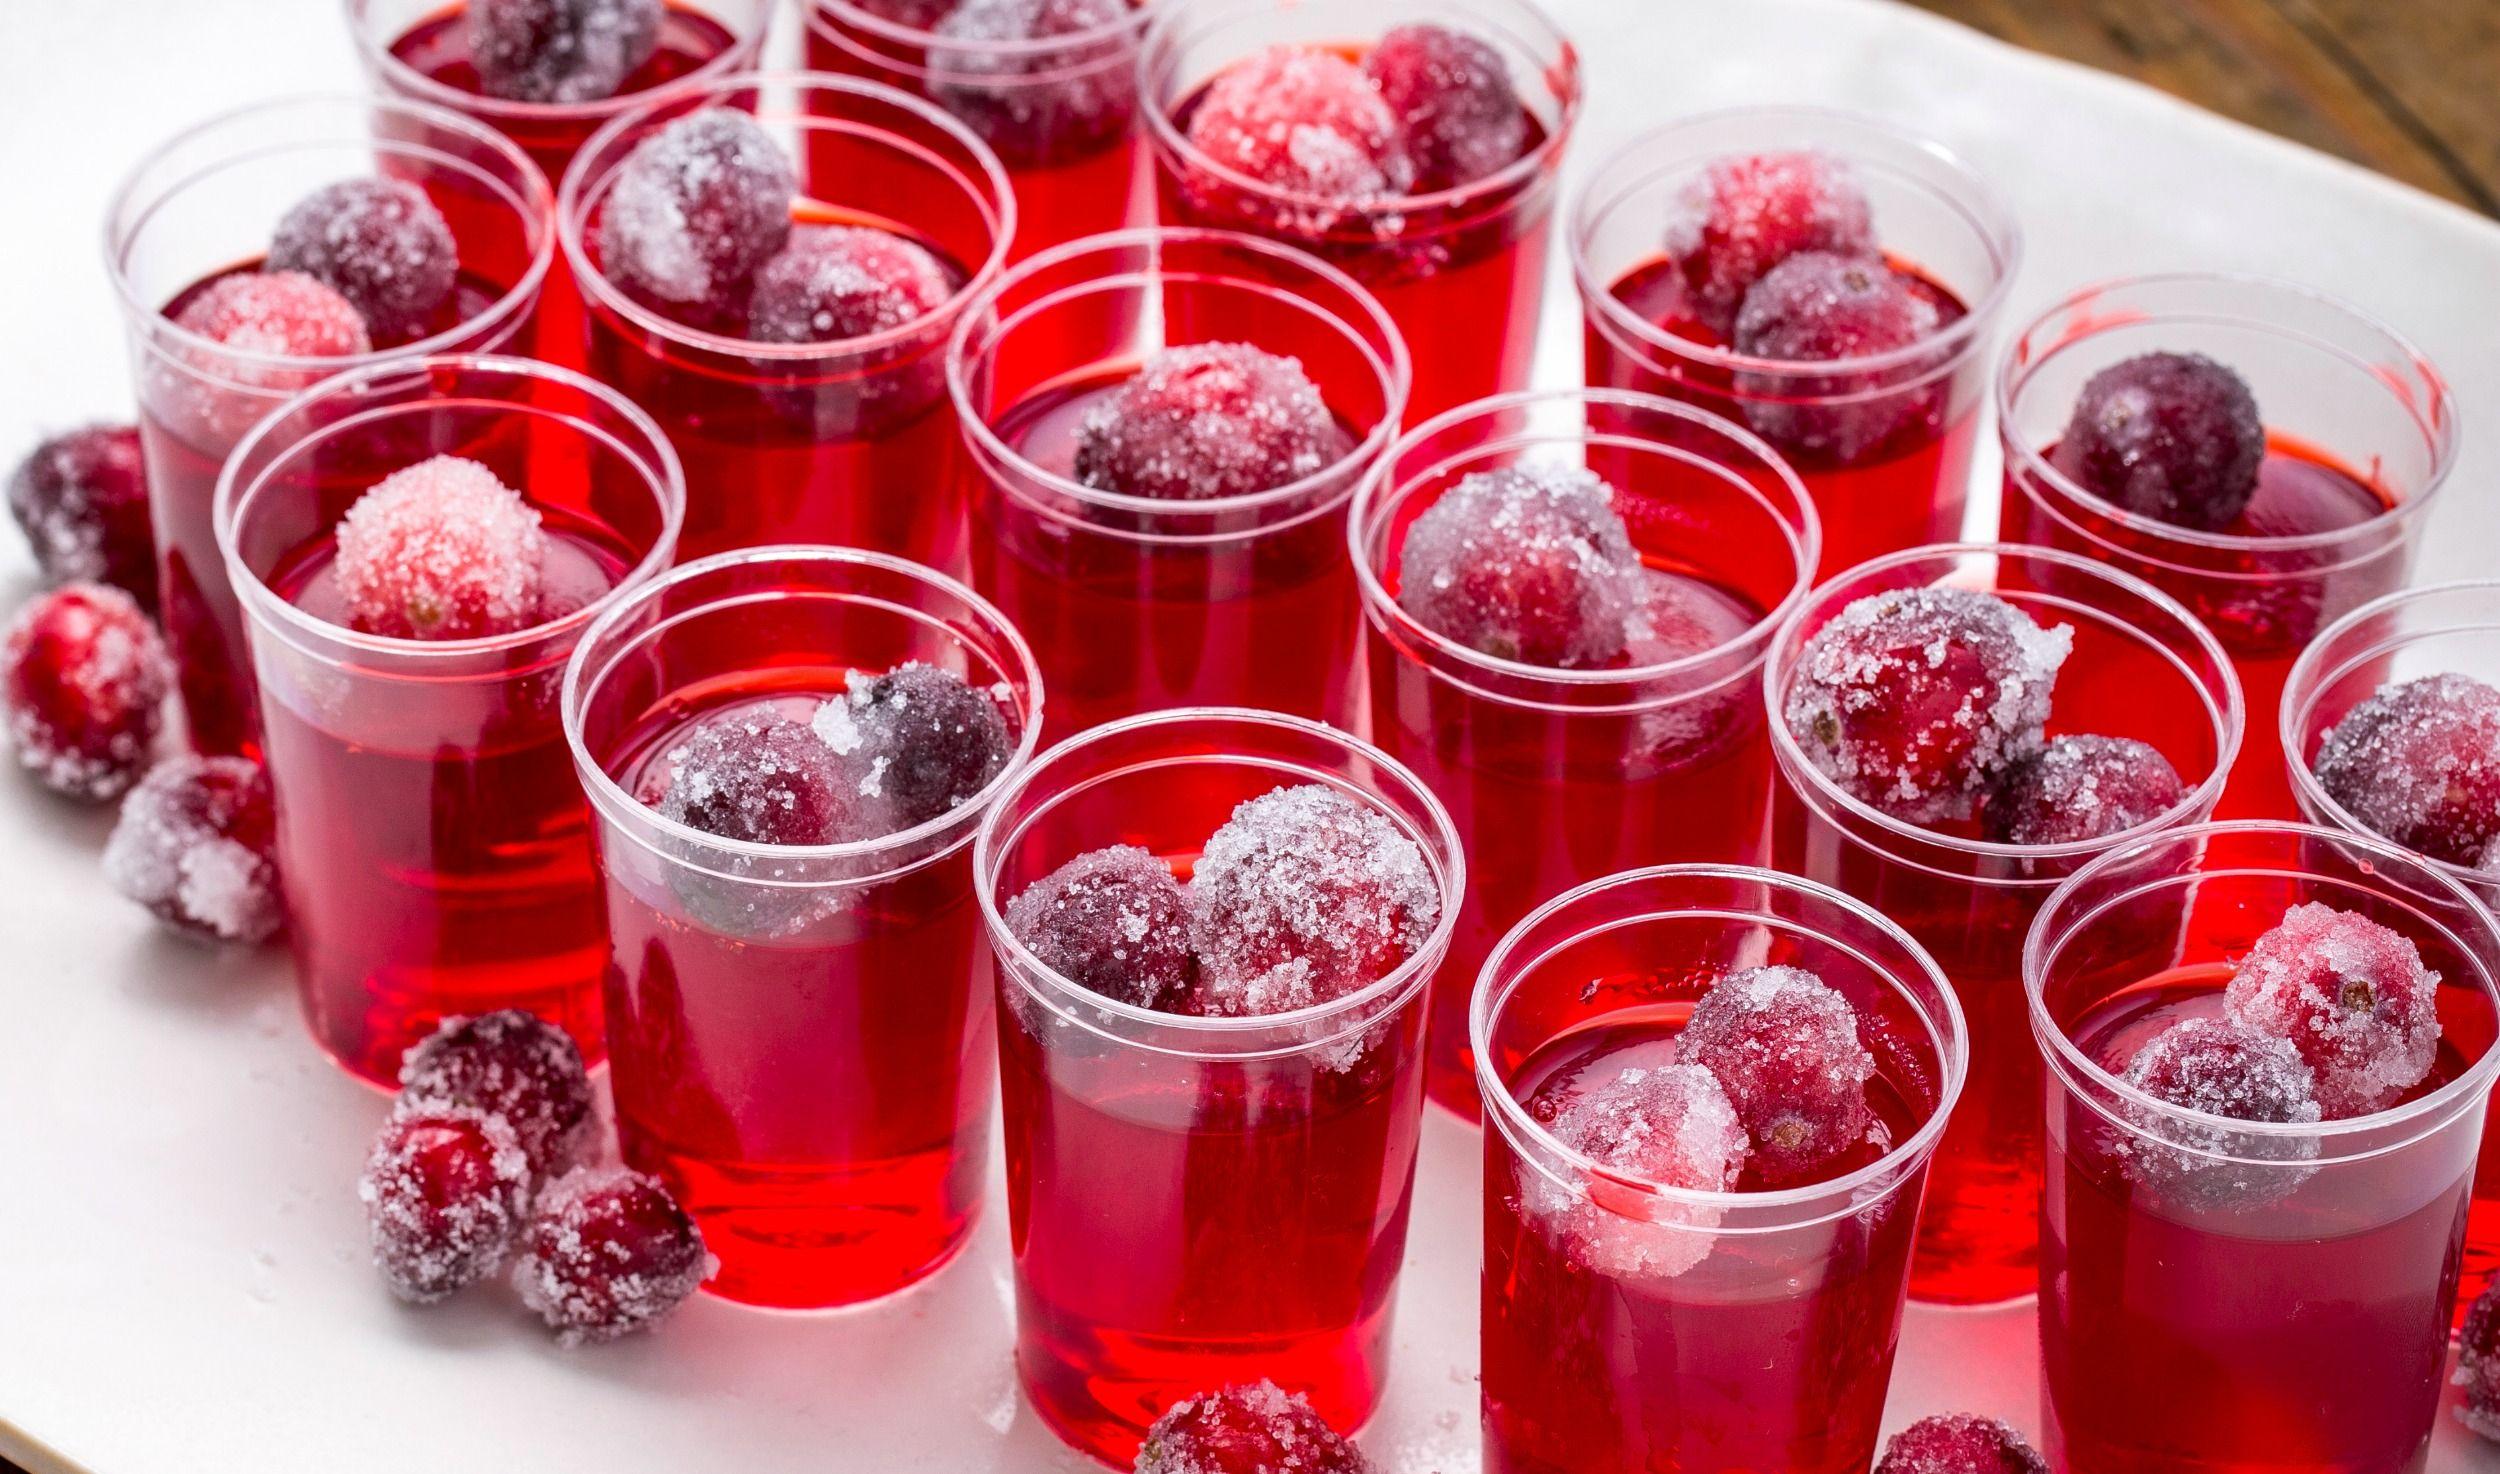 How To Make Jell-O Shots